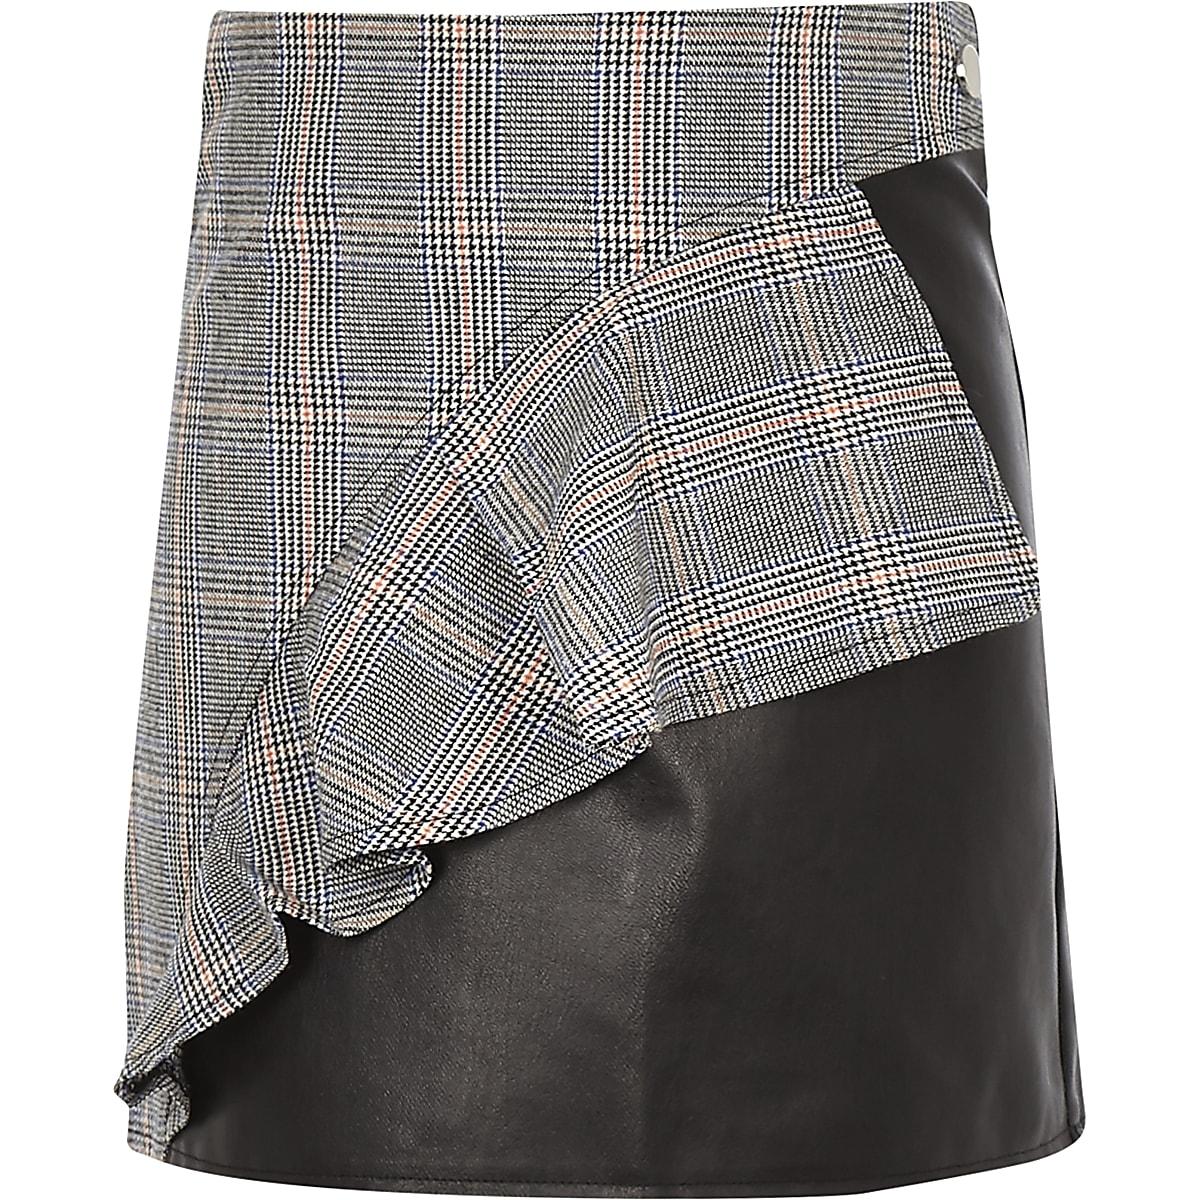 bfae1410f33b66 Girls black check print leather frill skirt